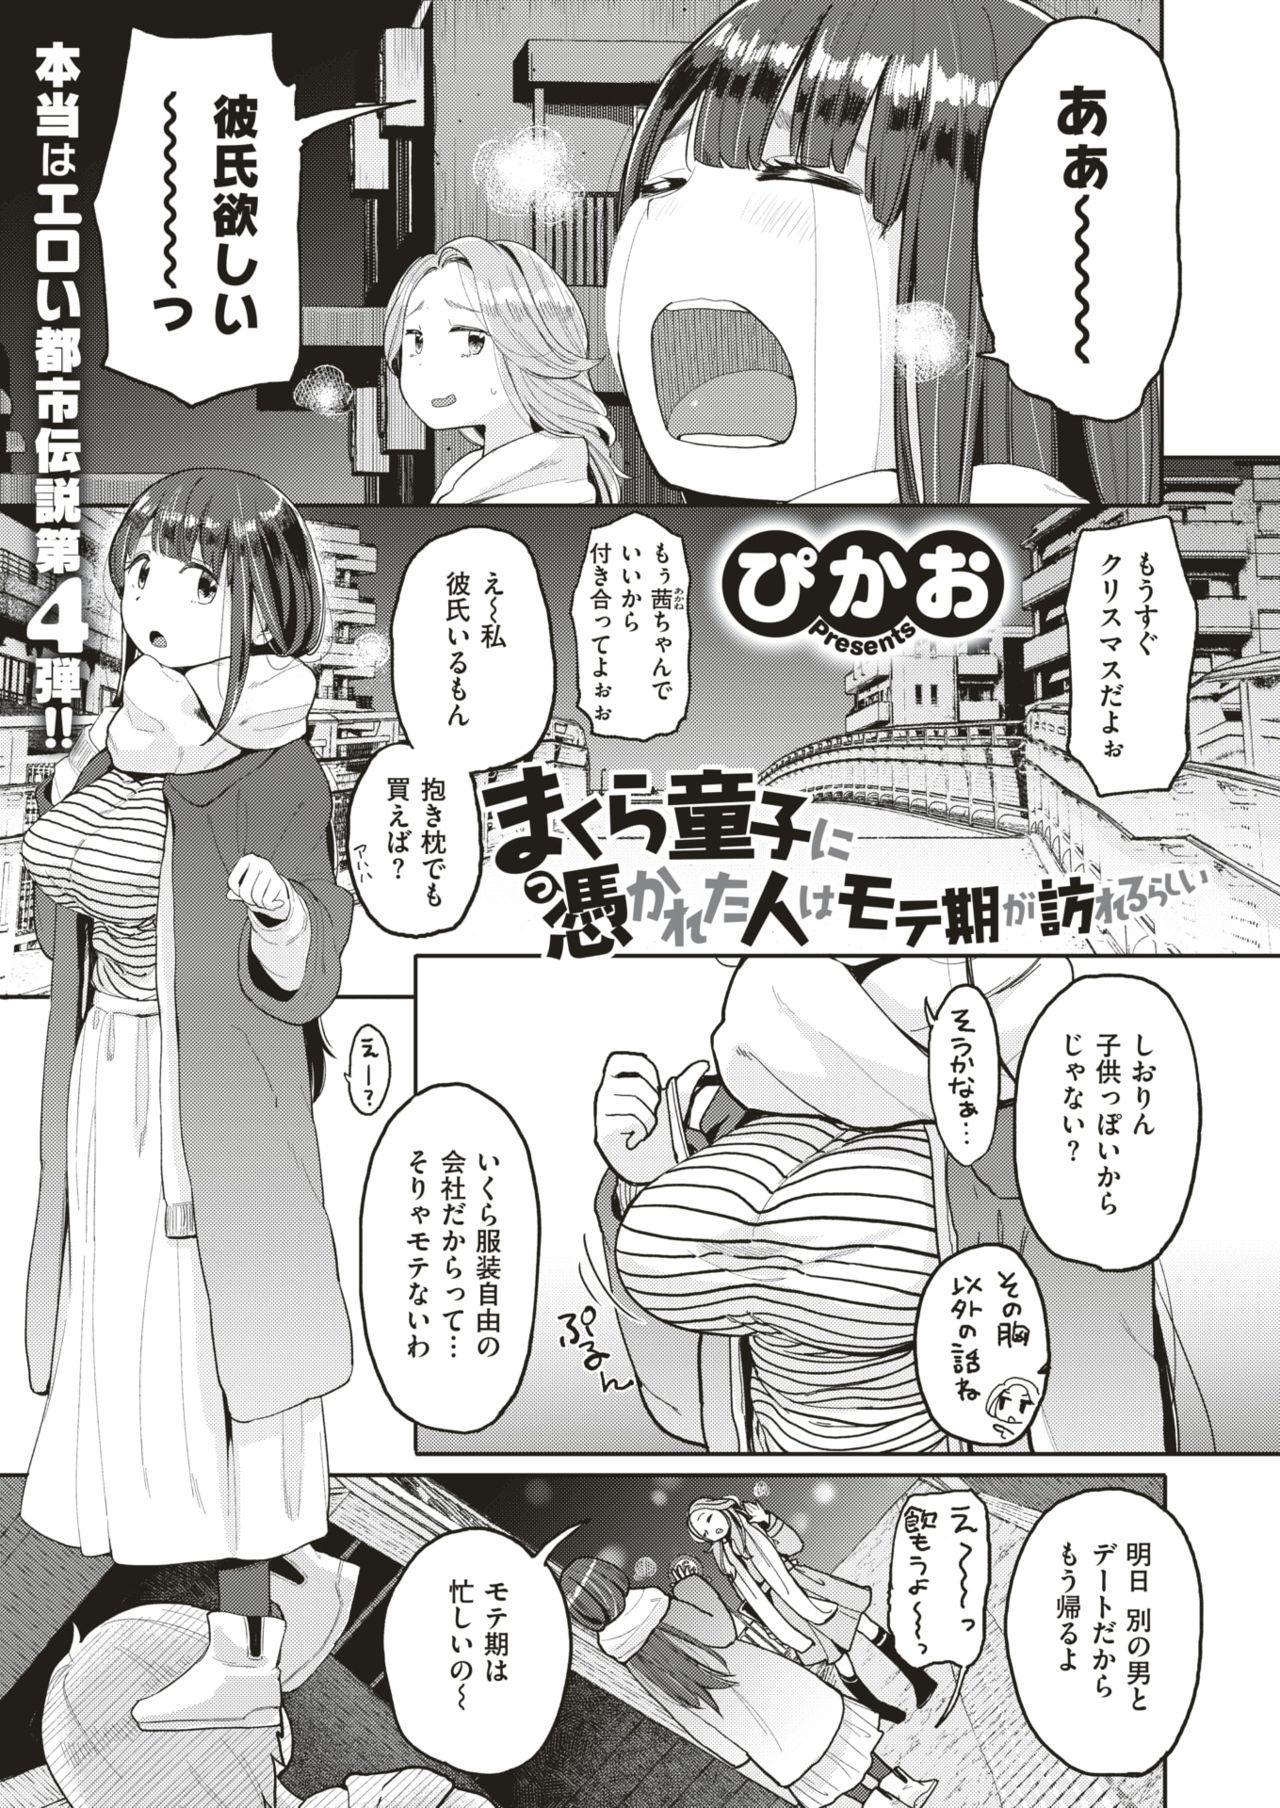 COMIC HAPPINING Vol. 4 49